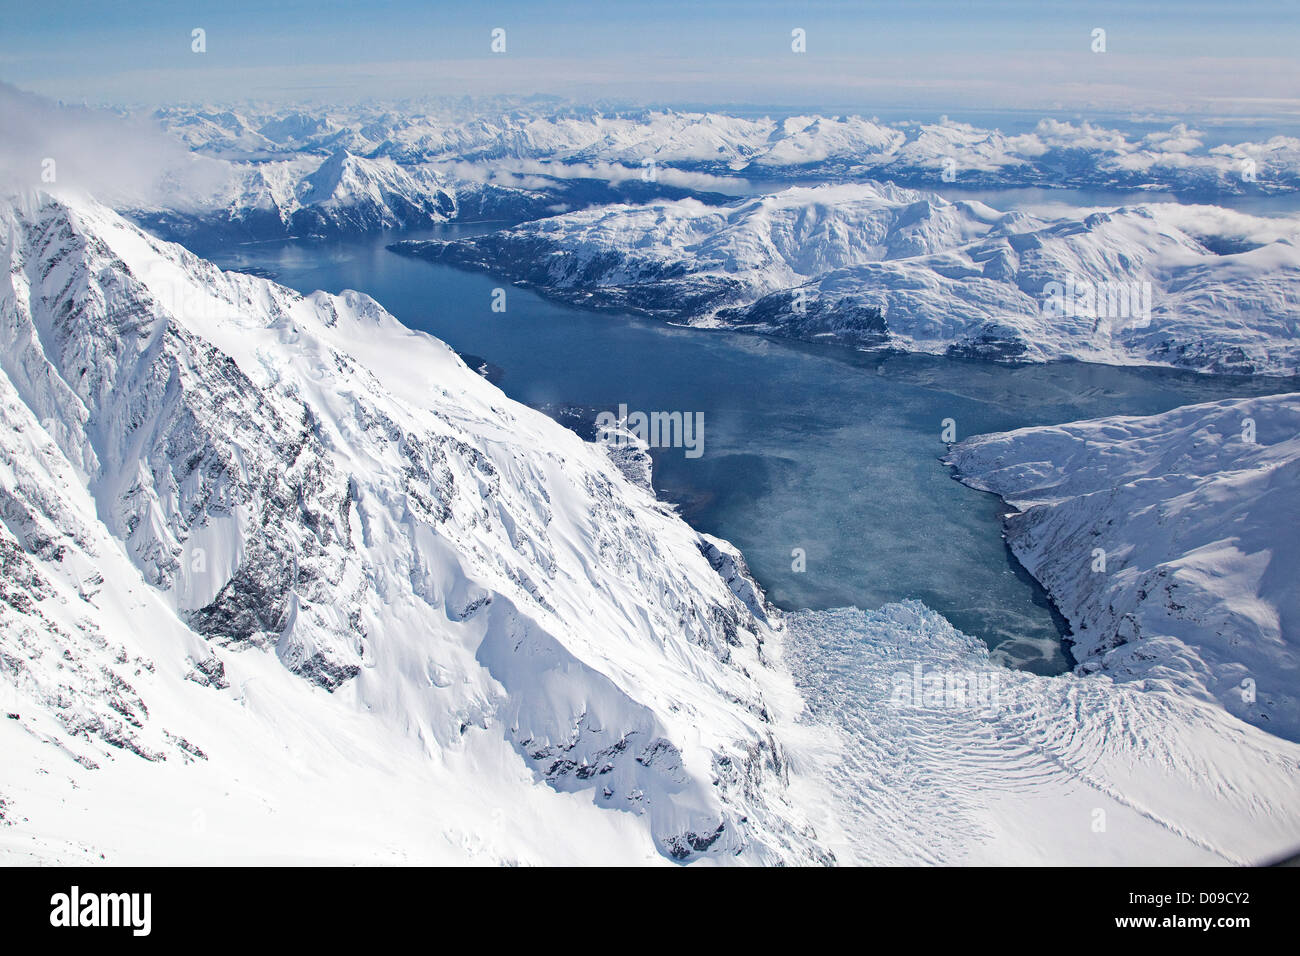 Aerial view of Harriman Fjord, Surprise Glacier, Chugach Mountains, Alaska, US - Stock Image